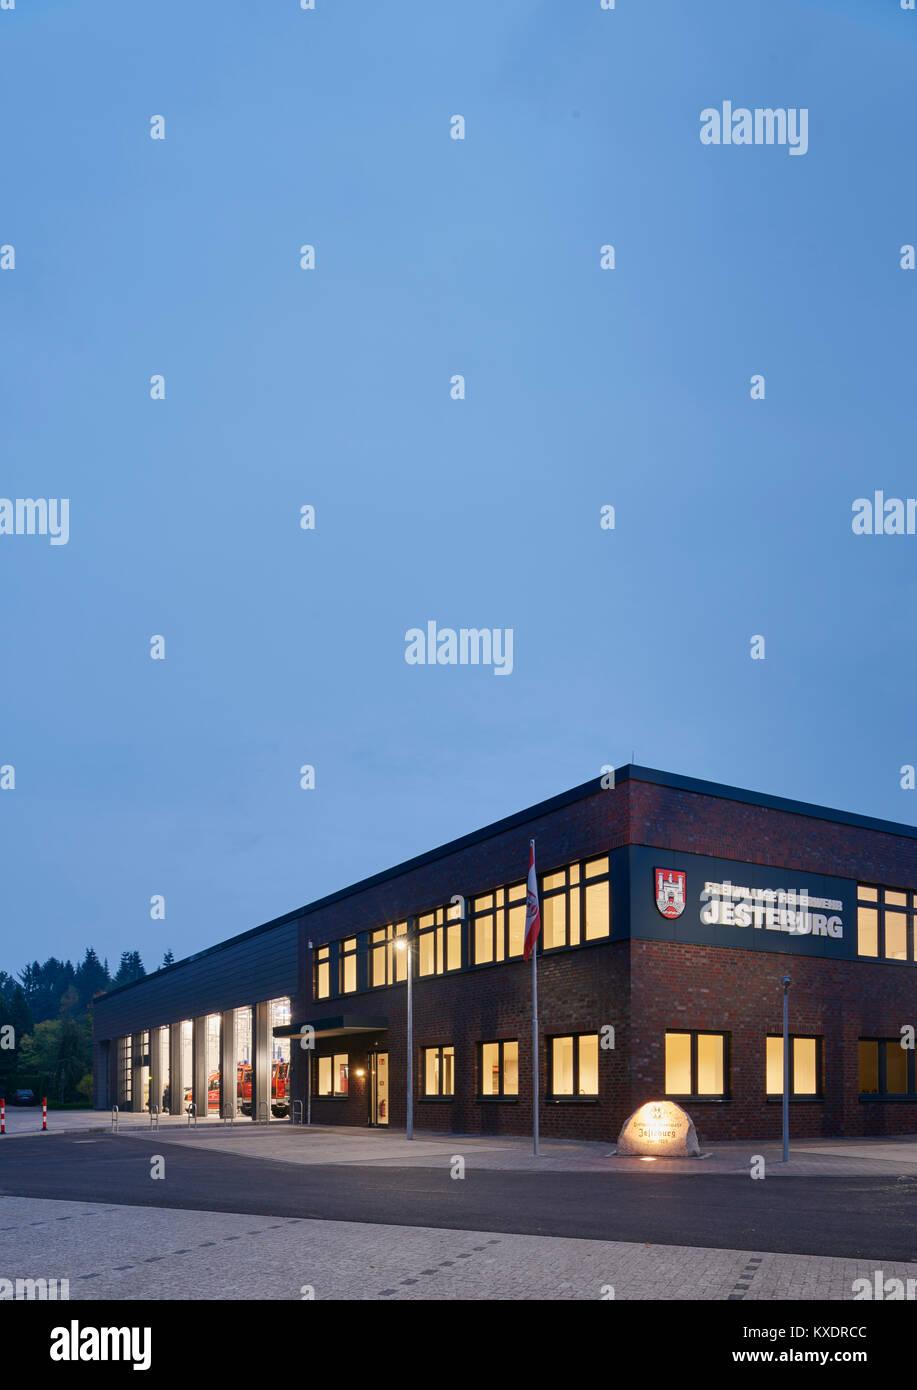 Feuerwache Jesteburg - Stock Image